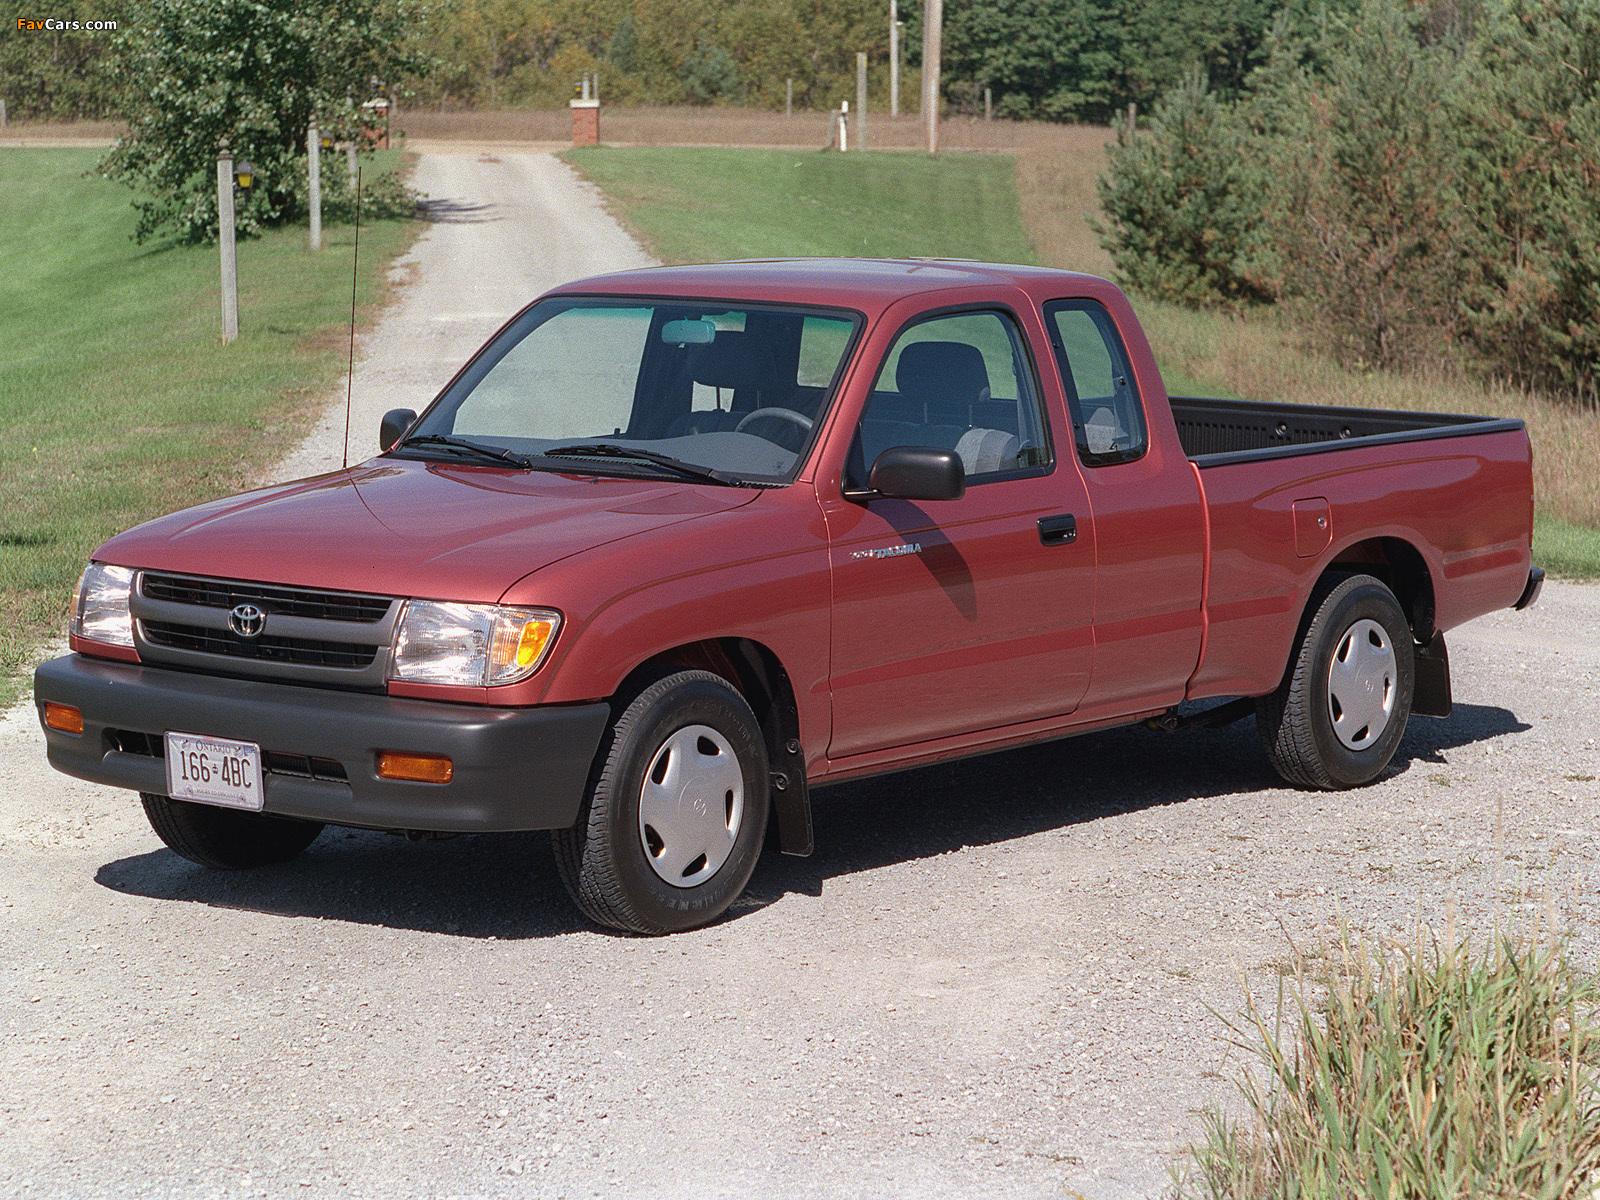 1998 Toyota Tacoma 2wd Toyota Tacoma Xtracab 2wd